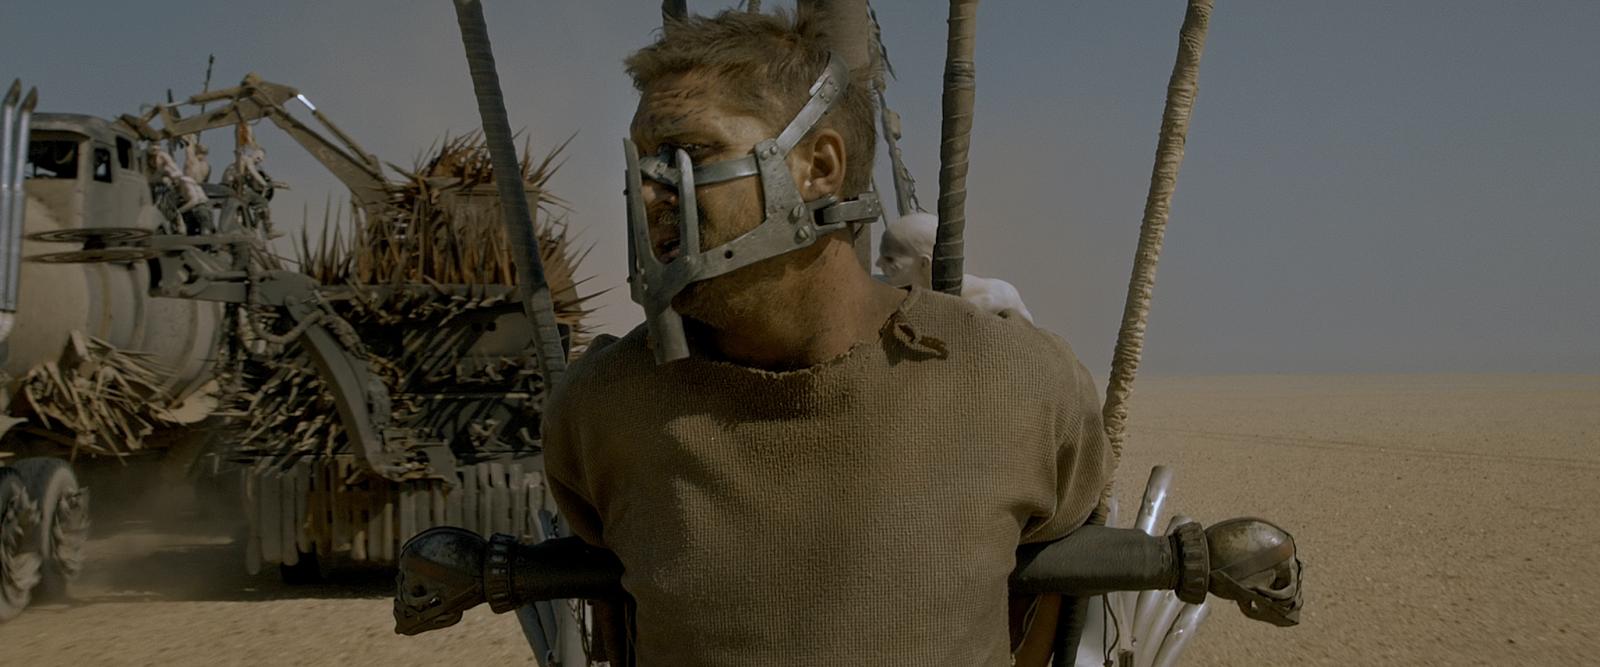 Mad Max: Furia en el Camino (2015) 4K UHD [HDR] Latino - Castellano - Ingles captura 1